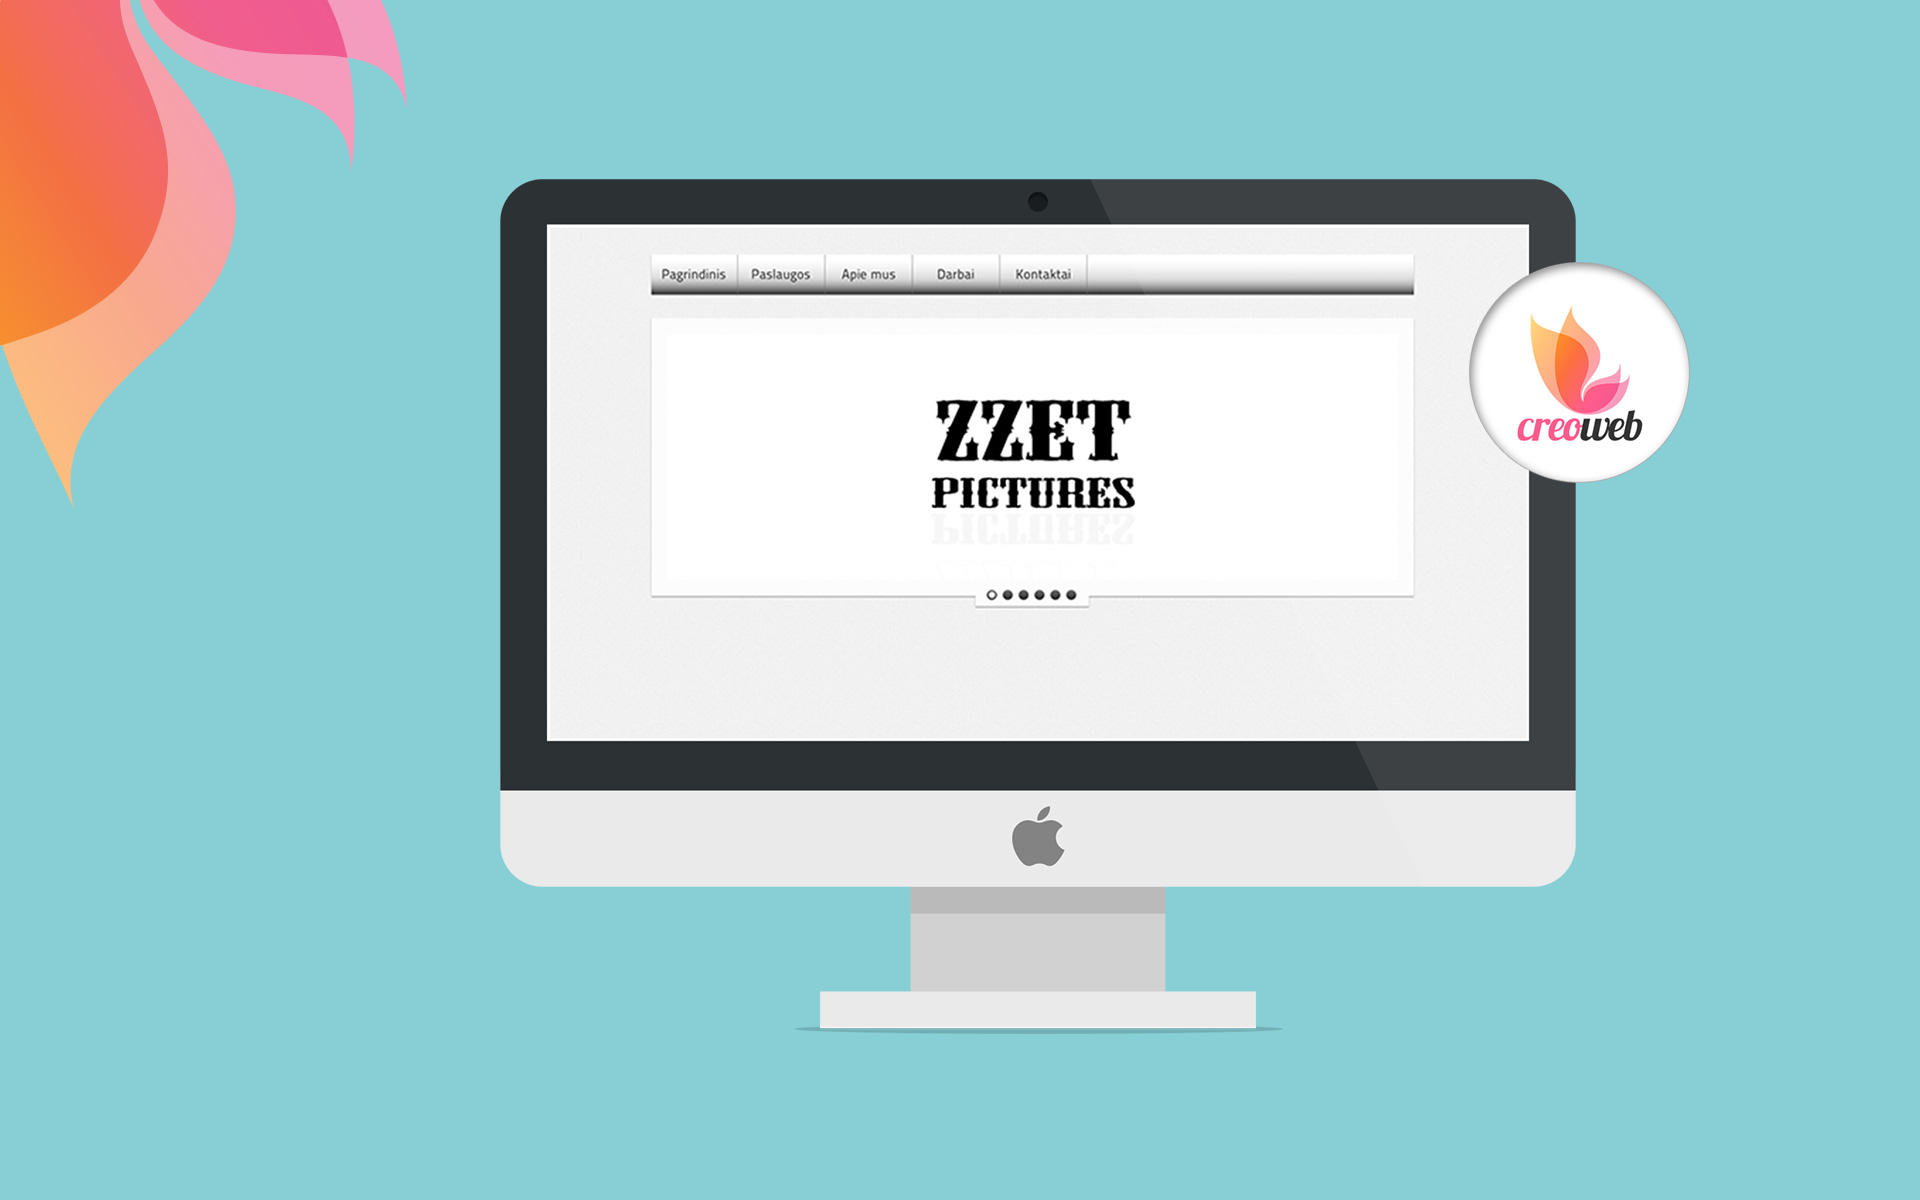 Zzet Pictures